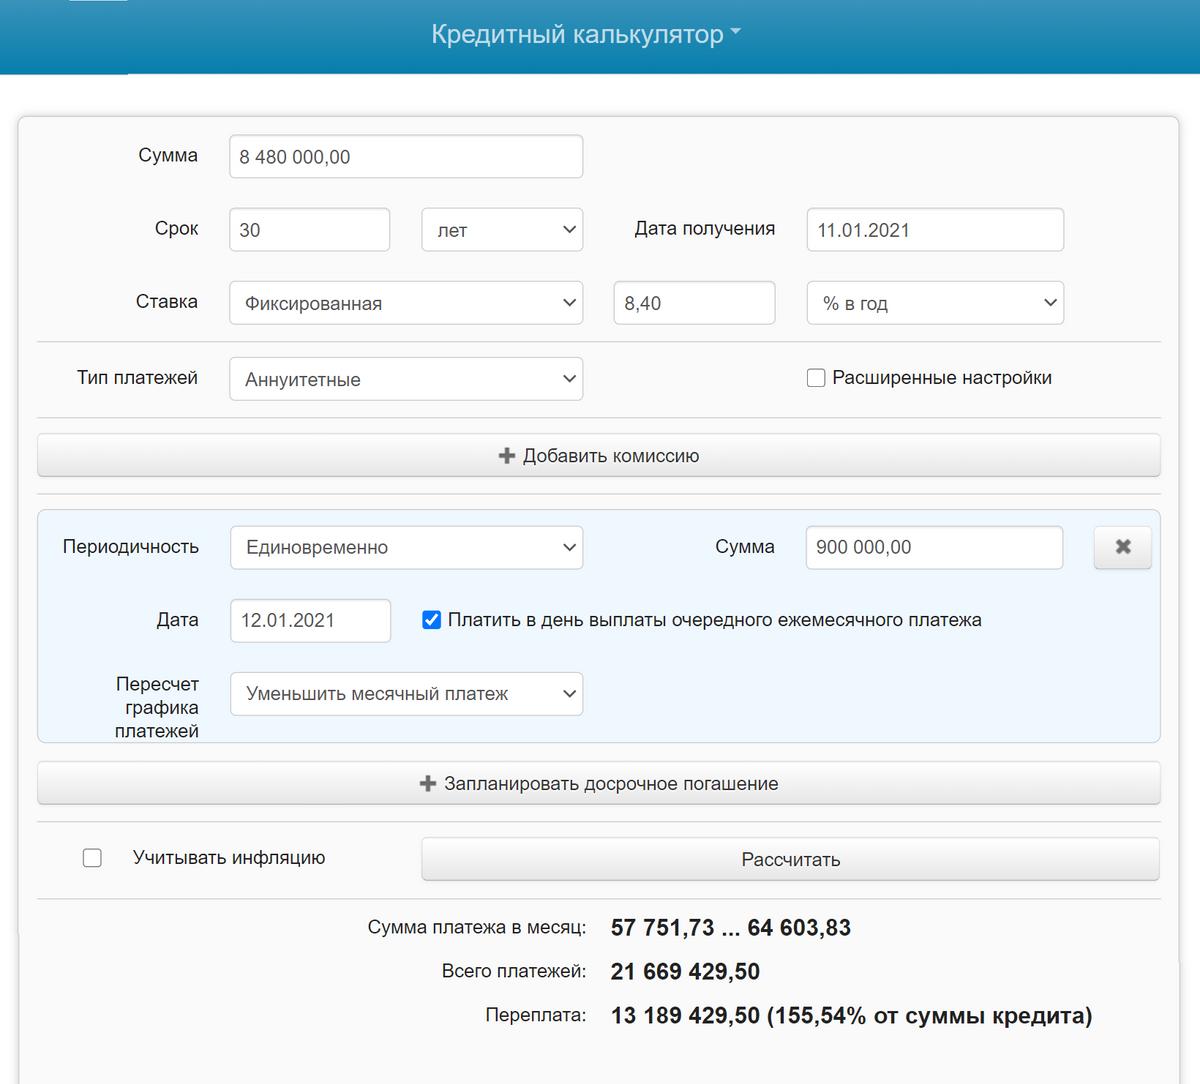 После досрочного погашения переплата снизится с&nbsp;14 759 936 до&nbsp;13 189 429<span class=ruble>Р</span>